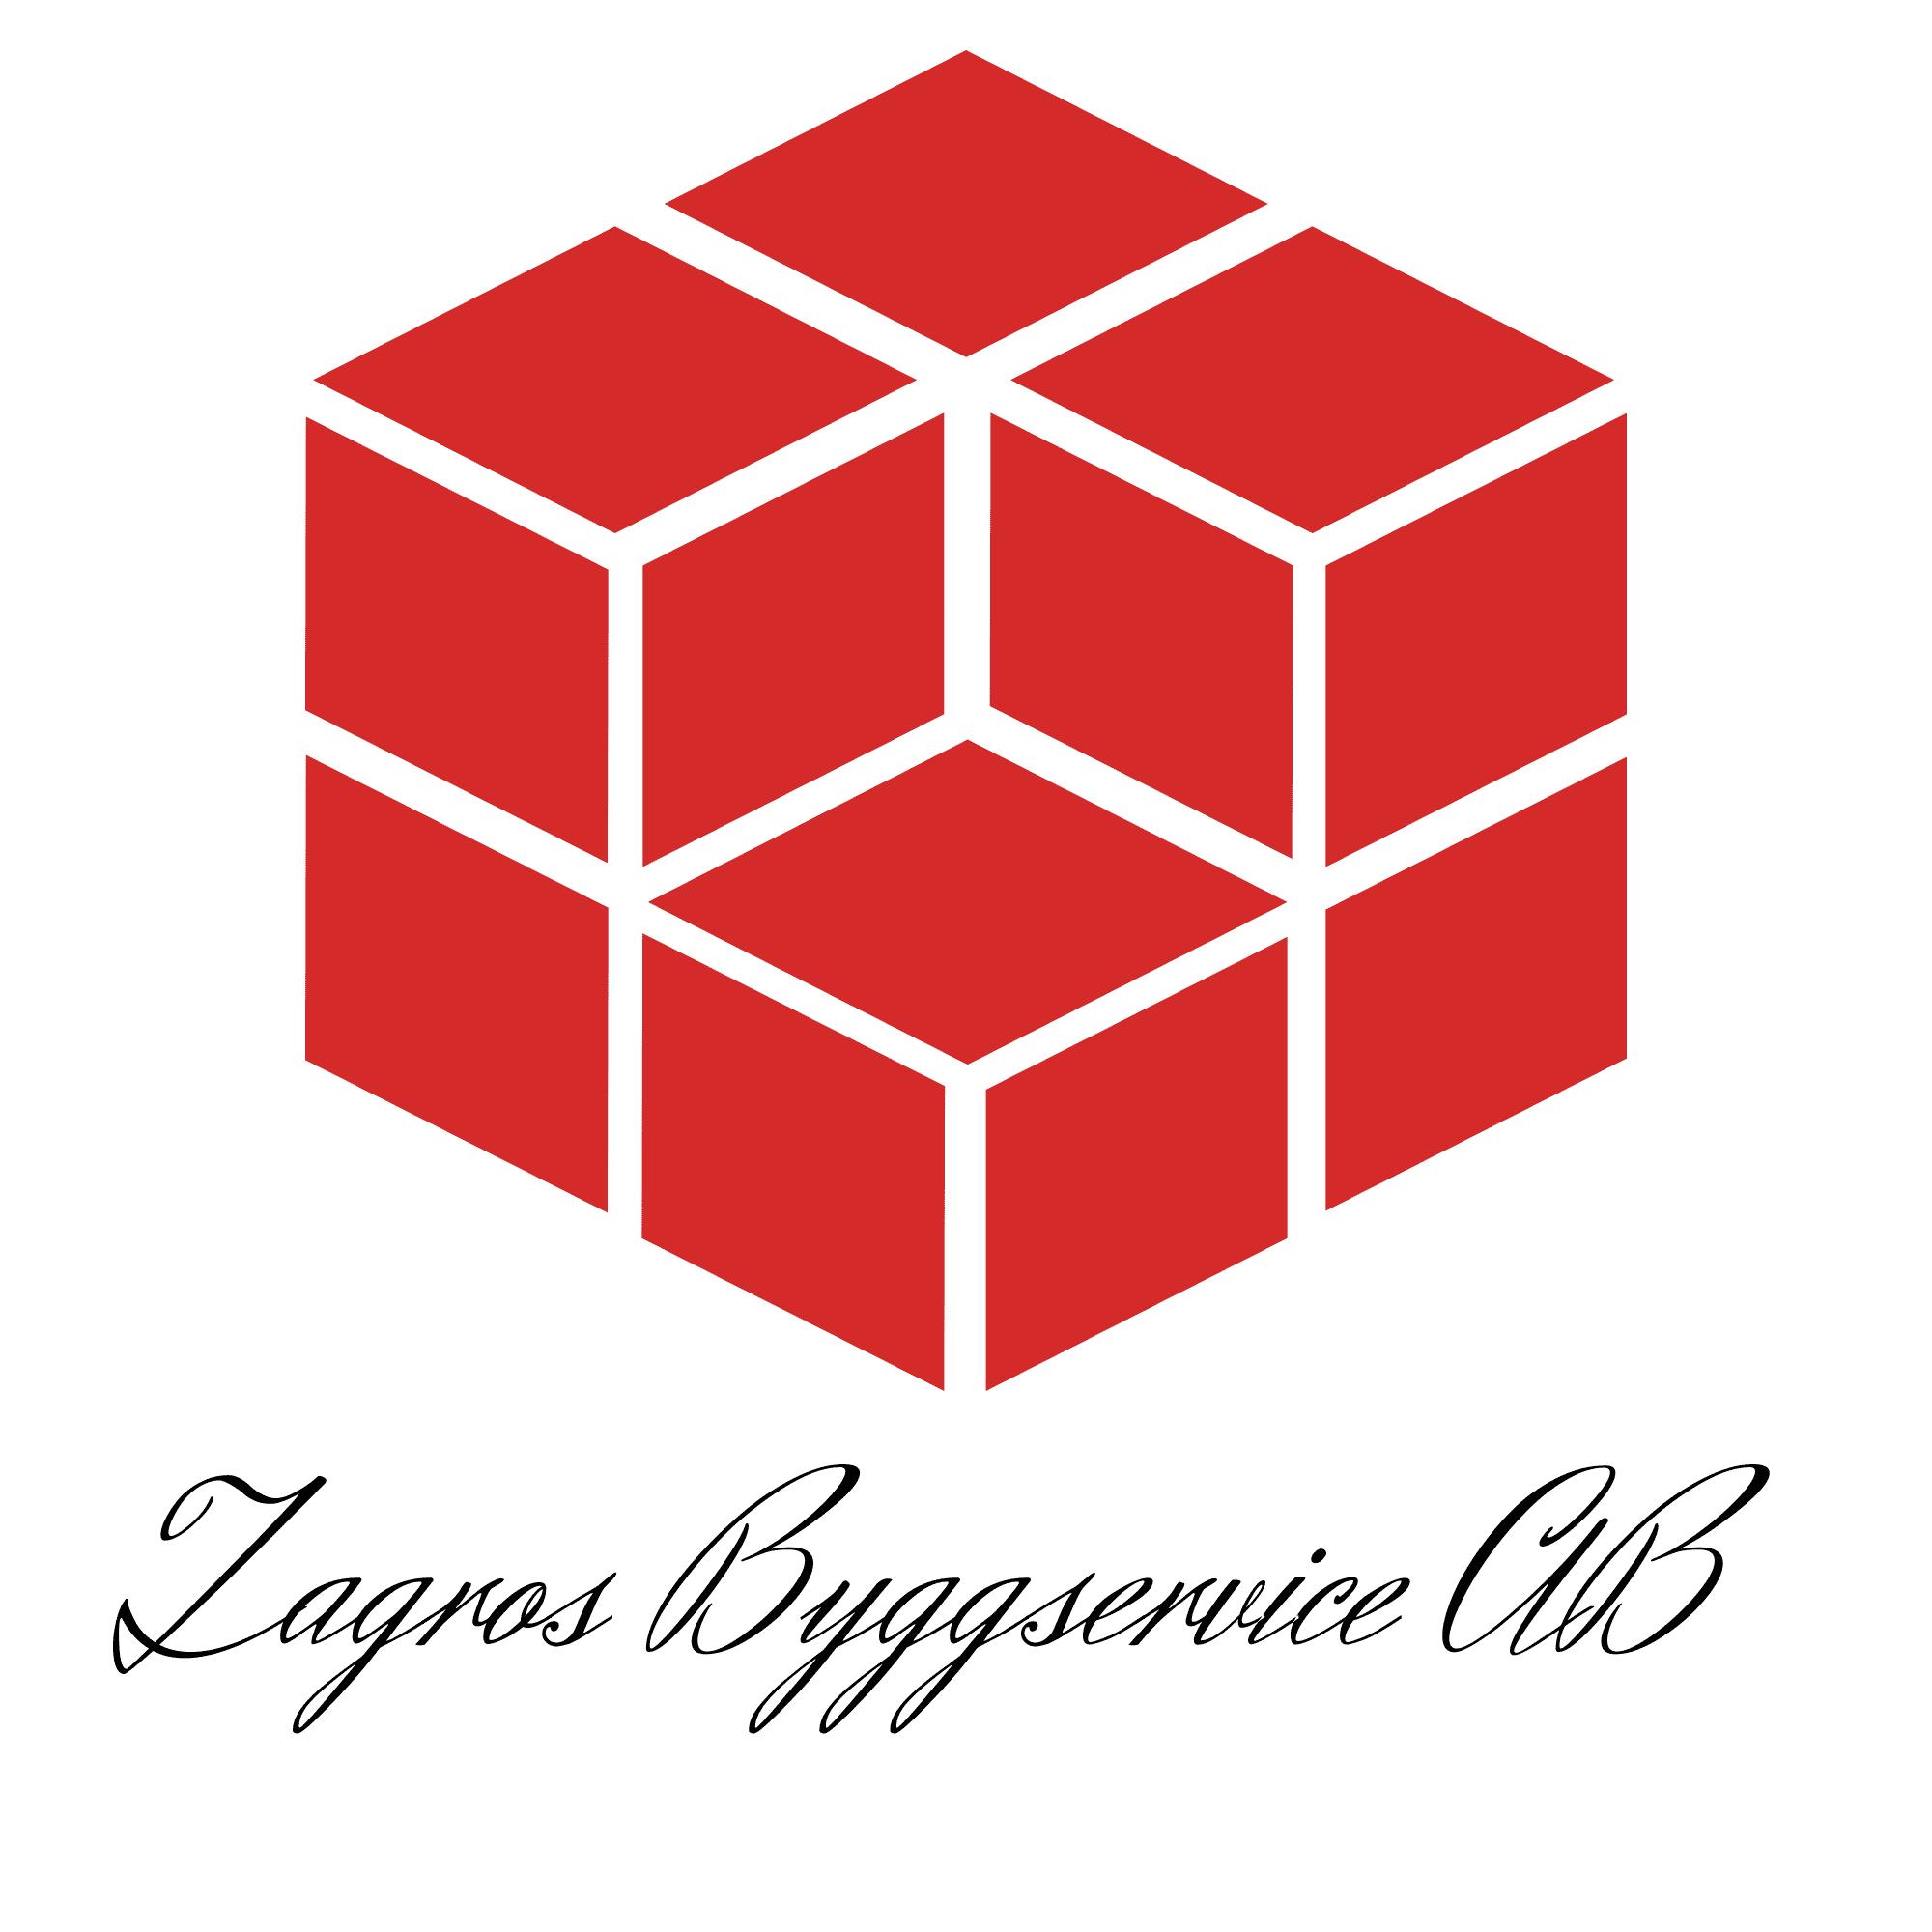 Logotyp för Zagros Byggservice AB